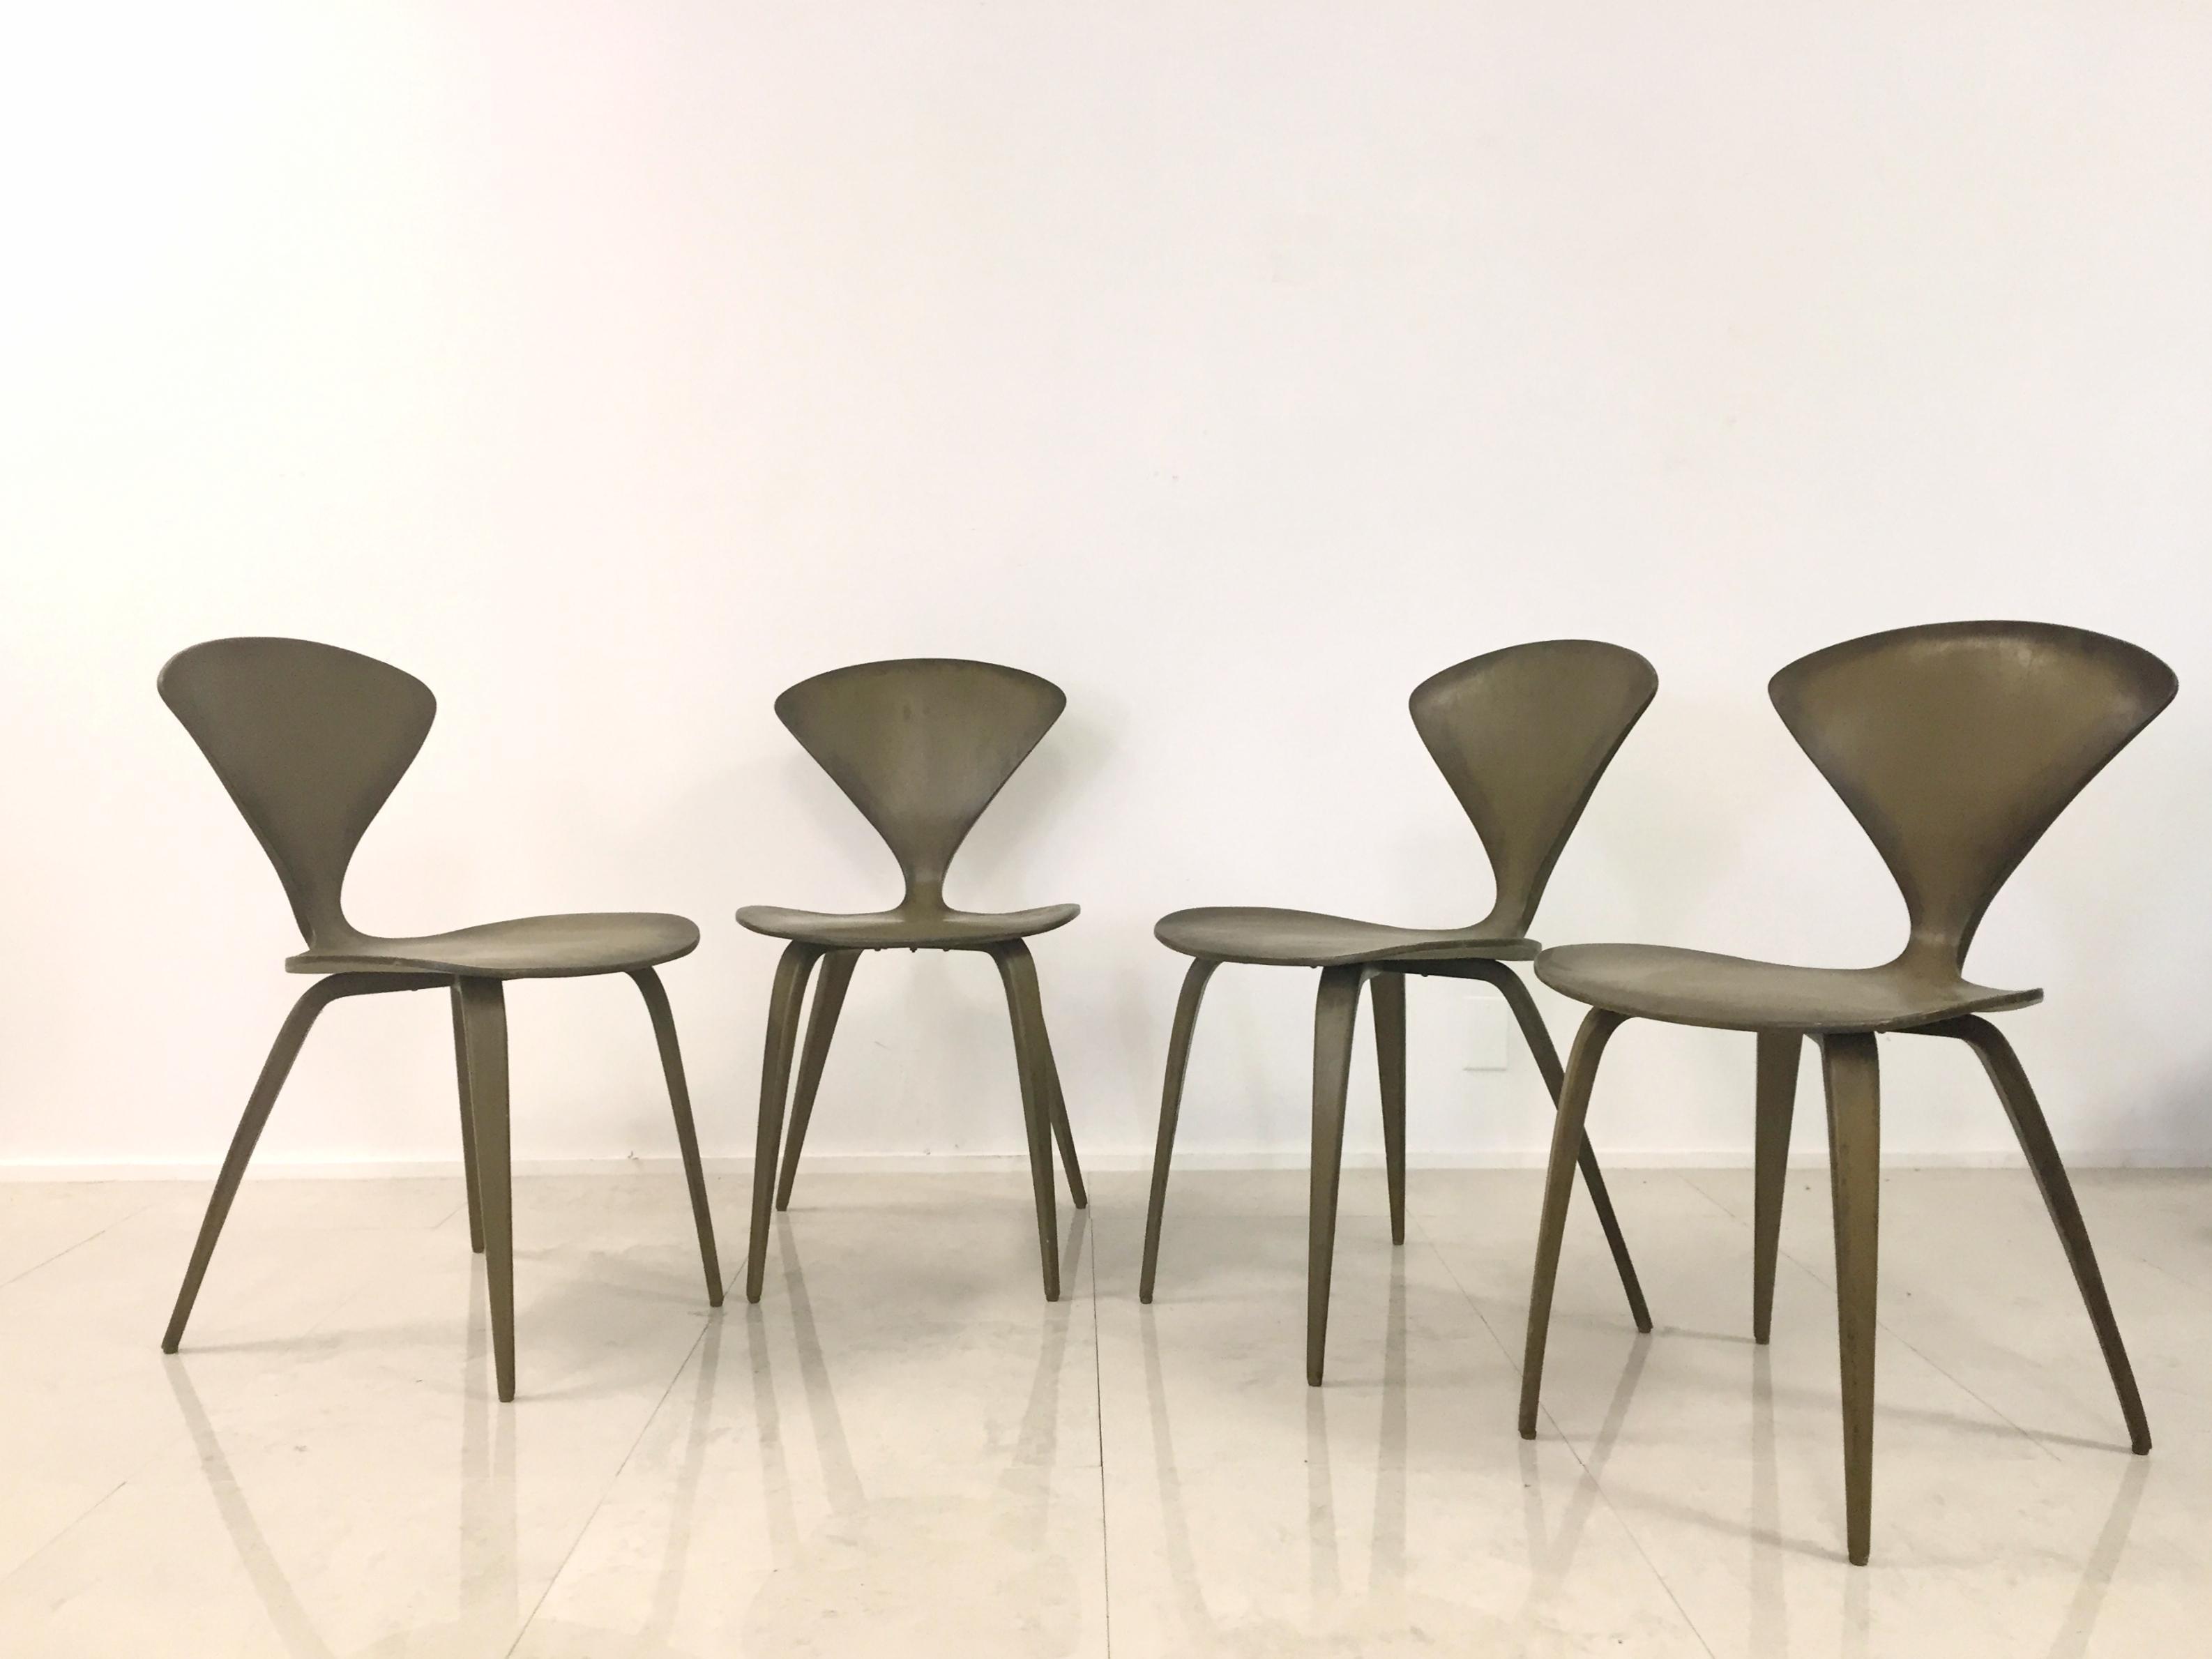 norman cherner for plycraft vintage chairs set 4 image 5 of 10